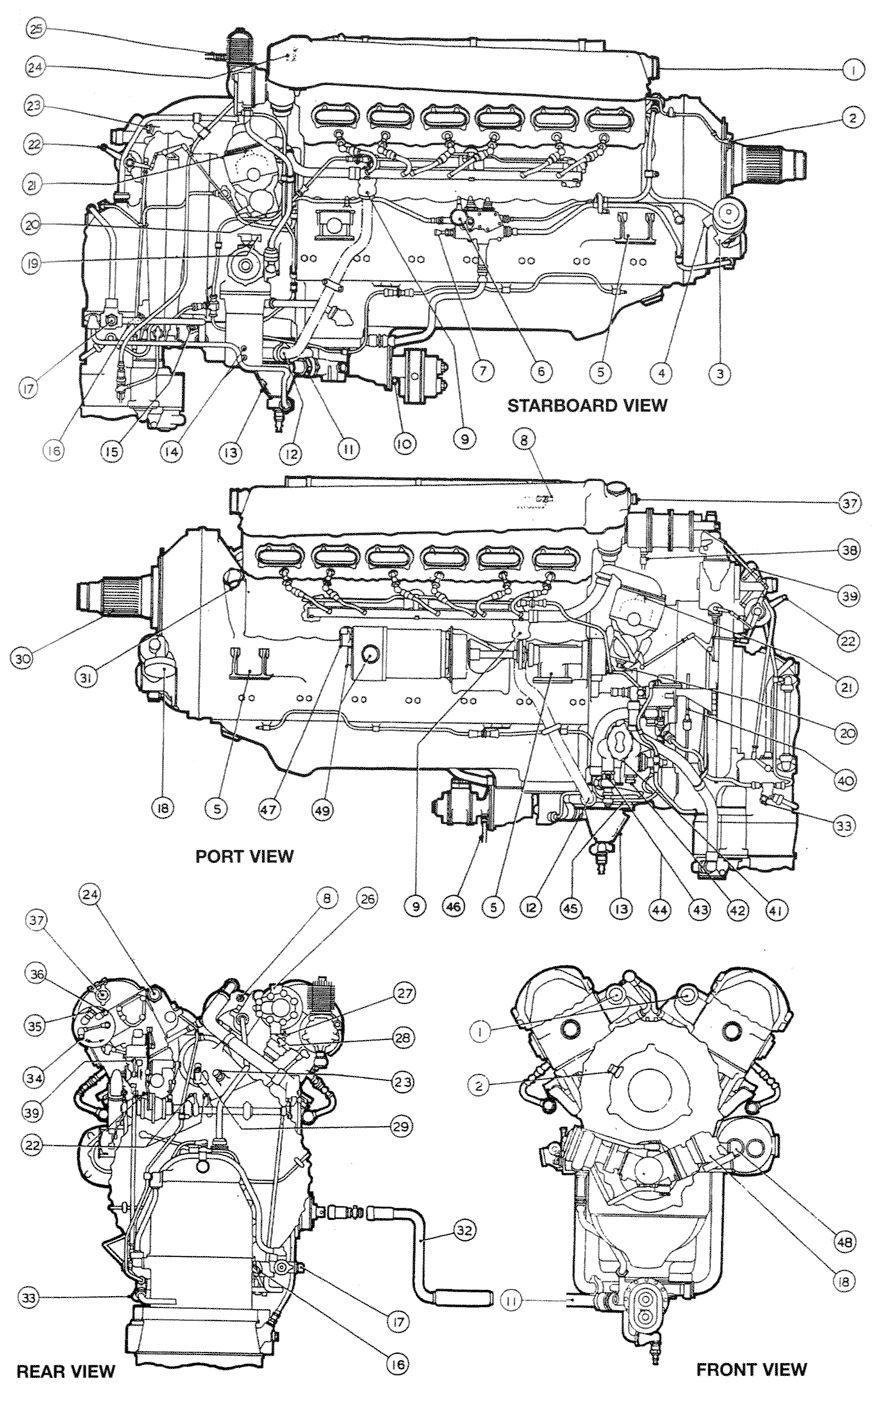 Mosquito motor Rolls-Royce 25 667 kilometros máxima